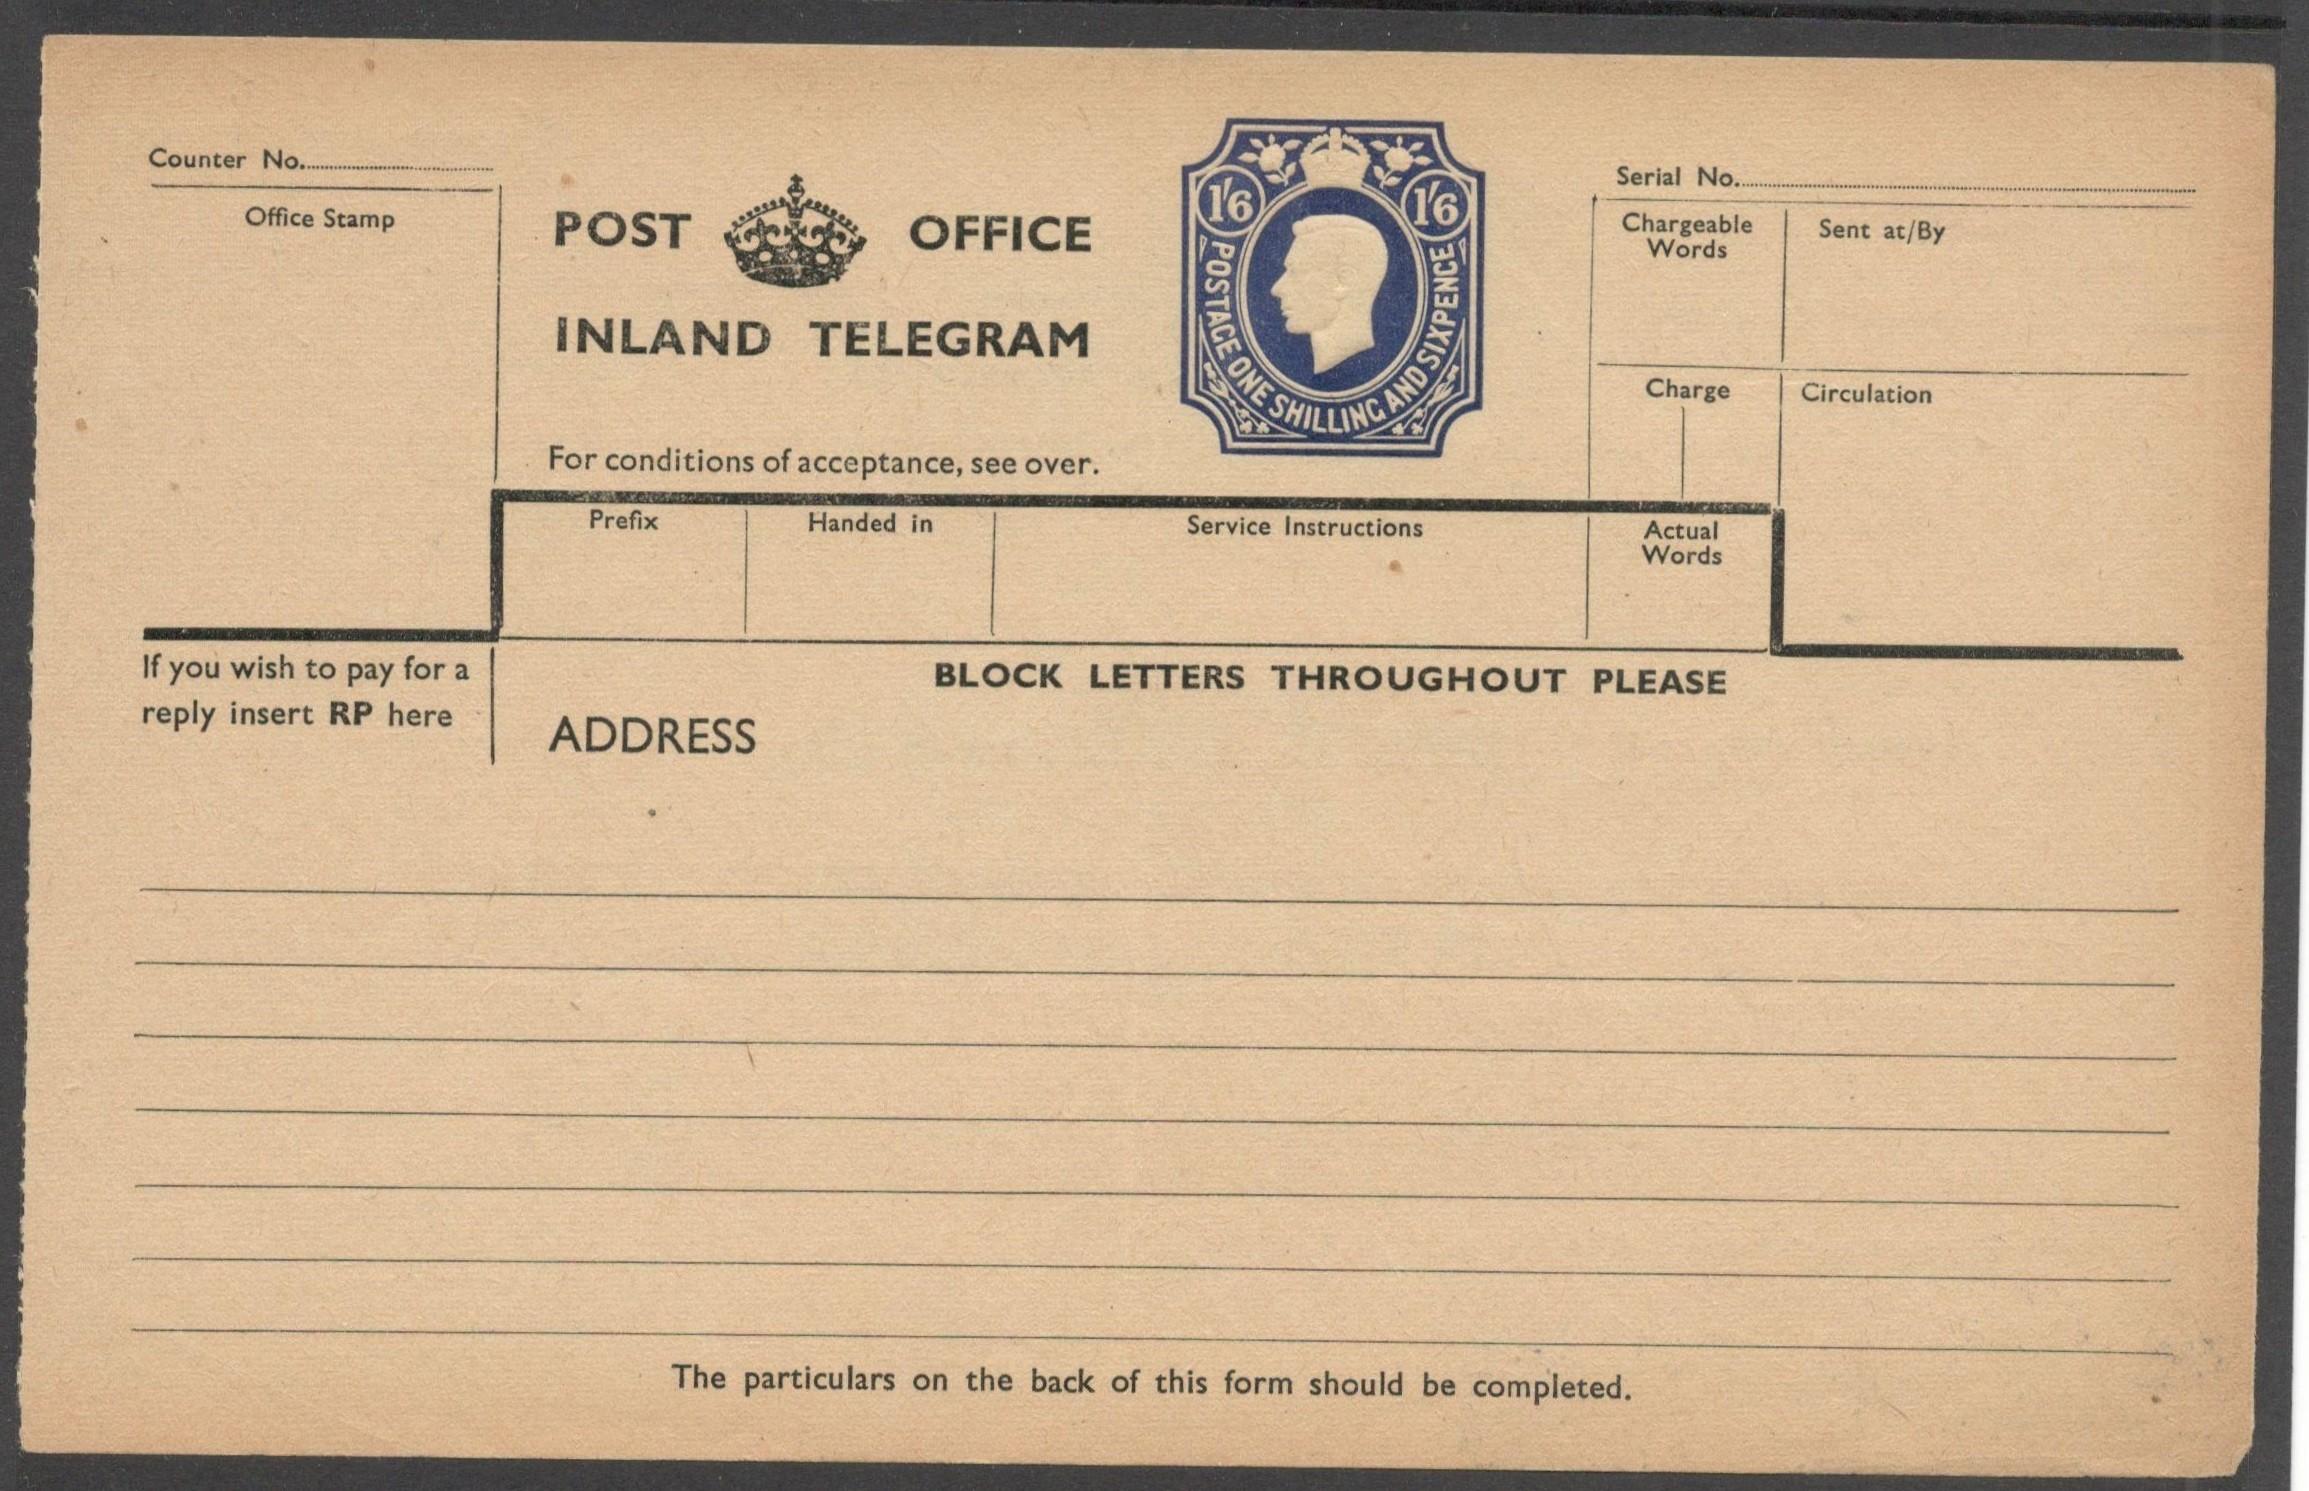 Lot 21 - POST OFFICE INLAND TELEGRAM 1951 KGVI TELEGRAPH FORM 1 SHILLING 6 PENCE